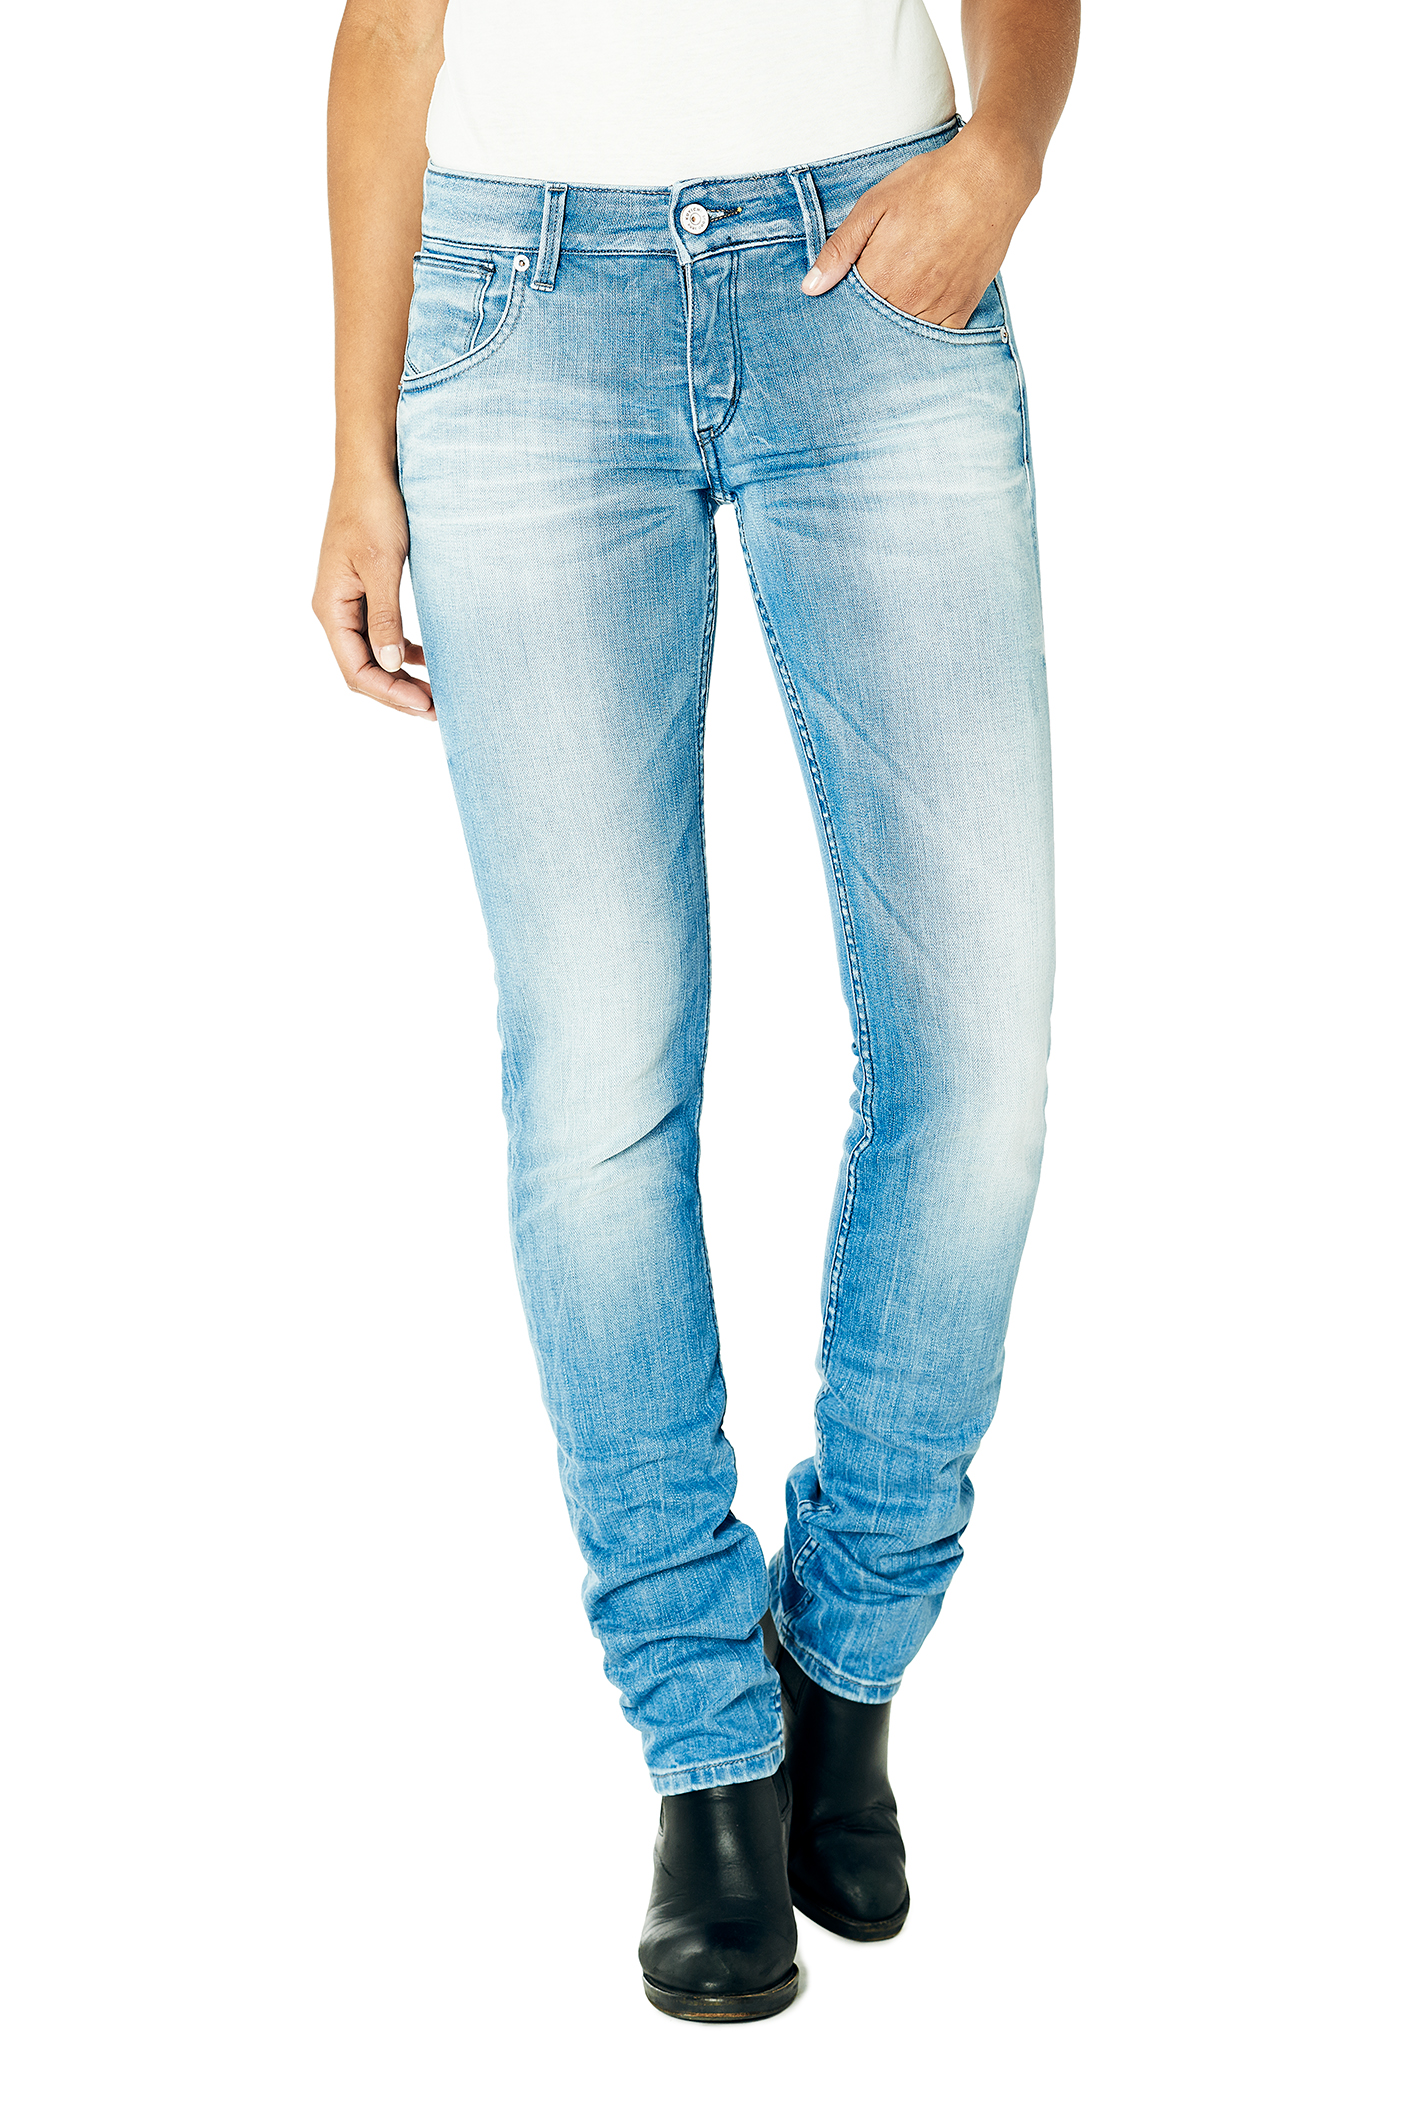 Kuyichi Mood · Lisa Jeans Fresh Fairtragen Slim QhxsrdCt